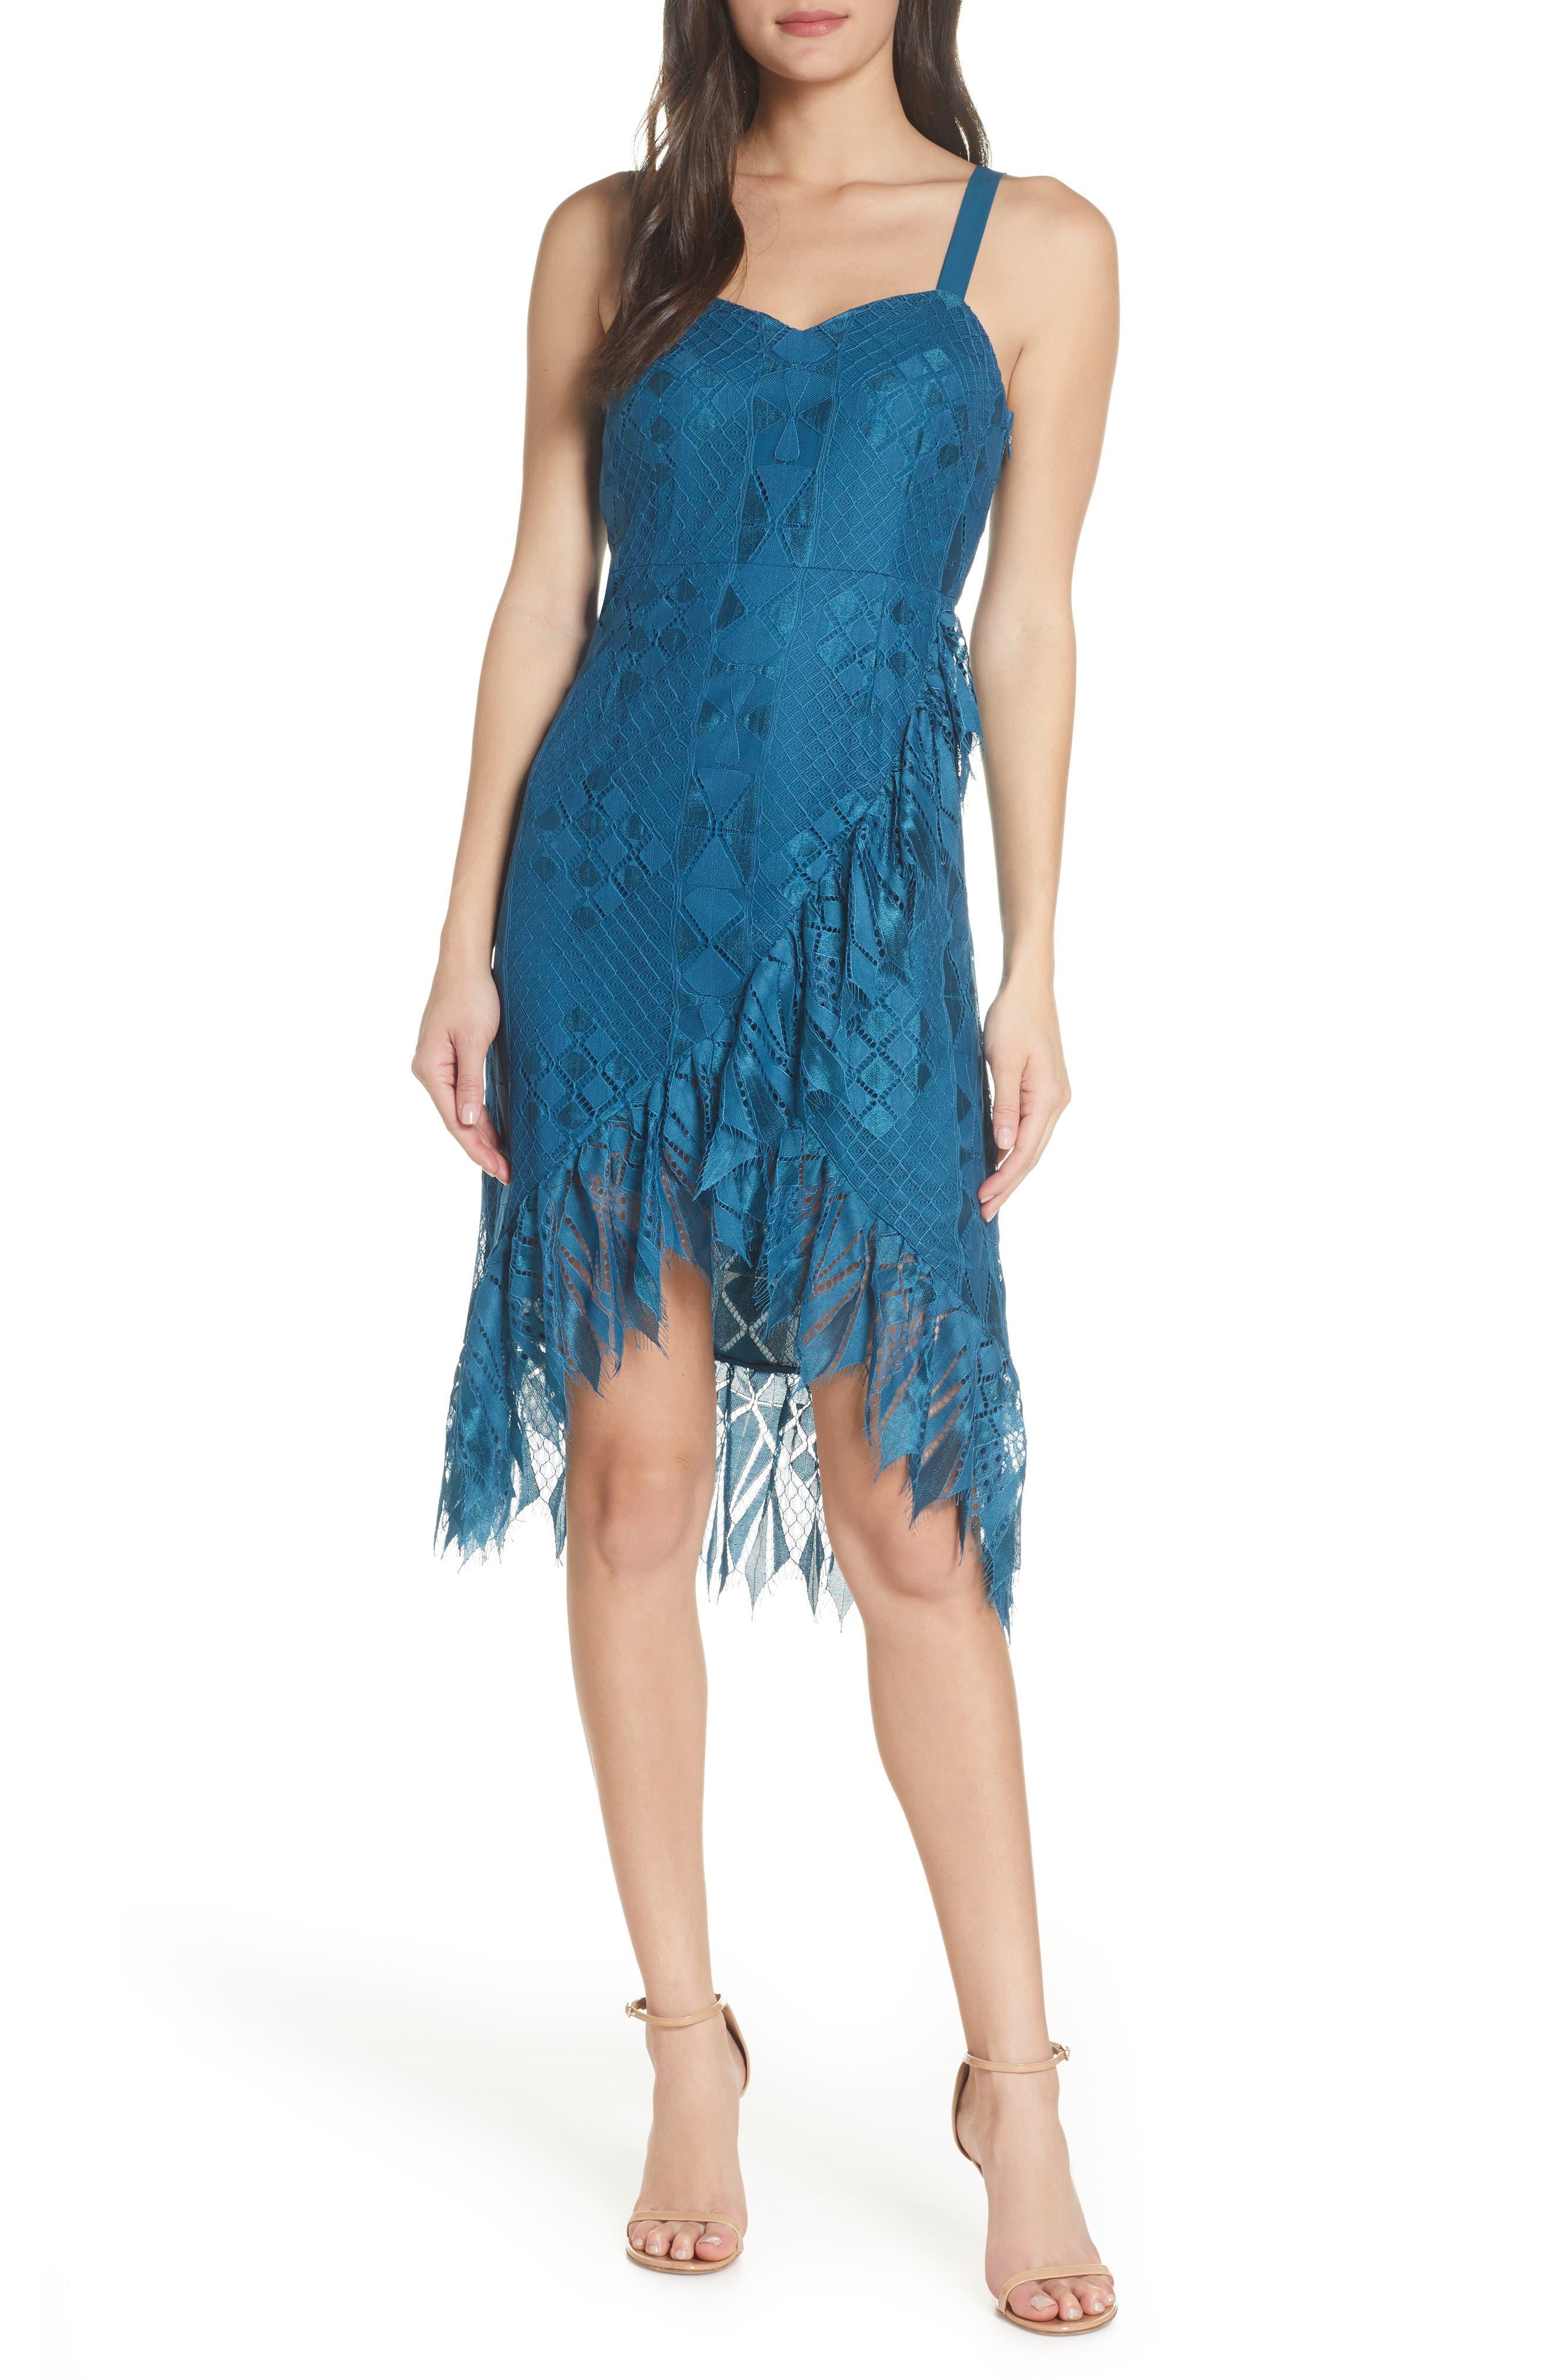 Foxiedox Lace Ruffle Sleeveless Cocktail Dress, Blue/green